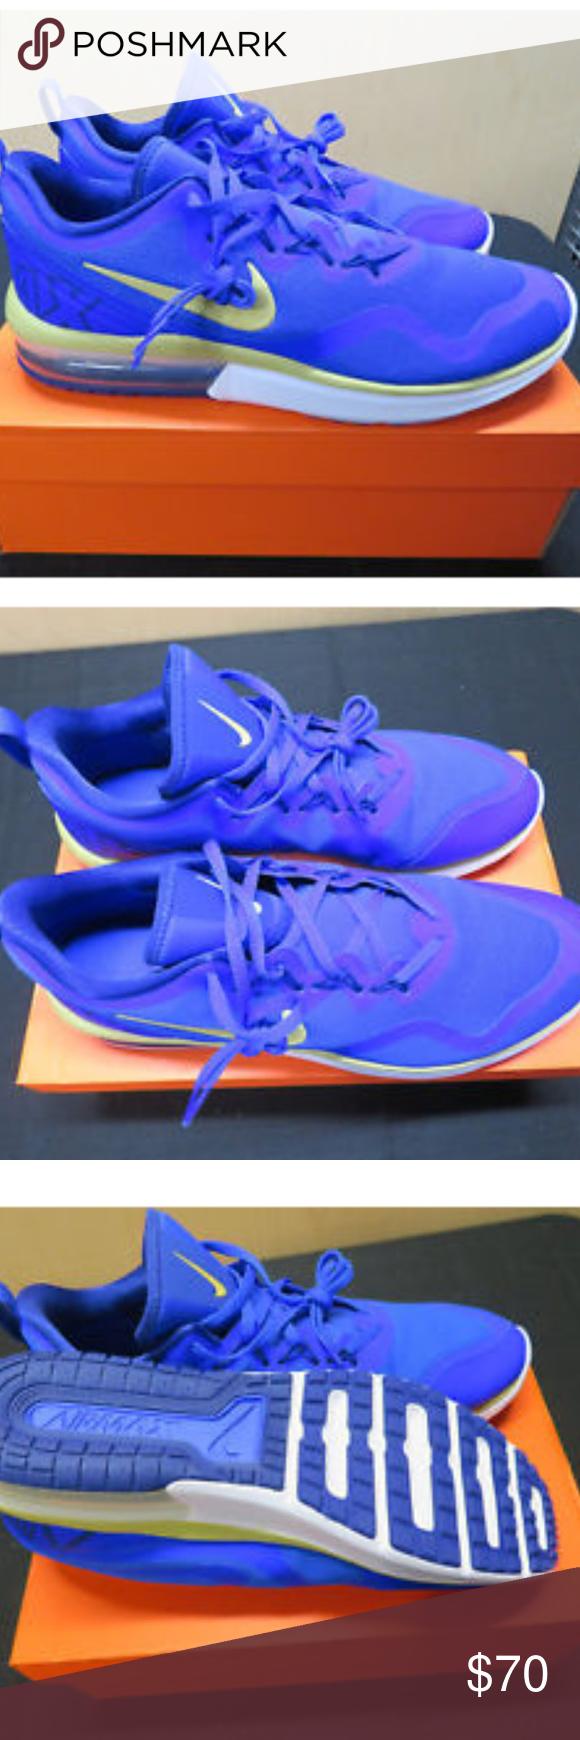 sports shoes 28042 9ae58 Nike Air Max Fury RUNNING SHOES SZ 13 NEW Nike Air Max Fury AA5739-402  RACER BLUE BUFF GOLD Men s Running Shoes SZ 13 Nike Shoes Athletic Shoes